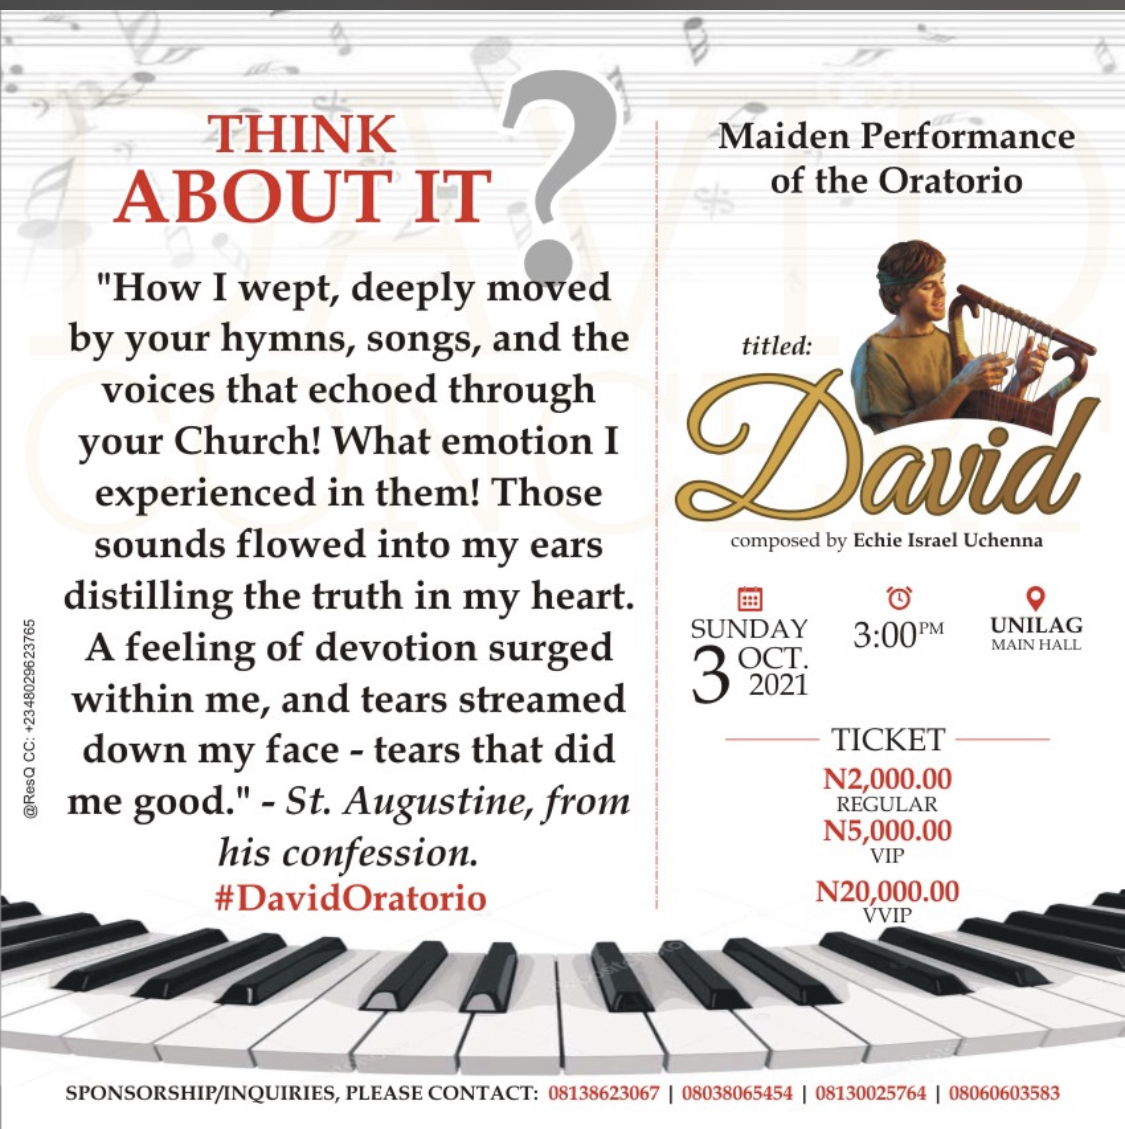 Maiden Performance of the Oratorio